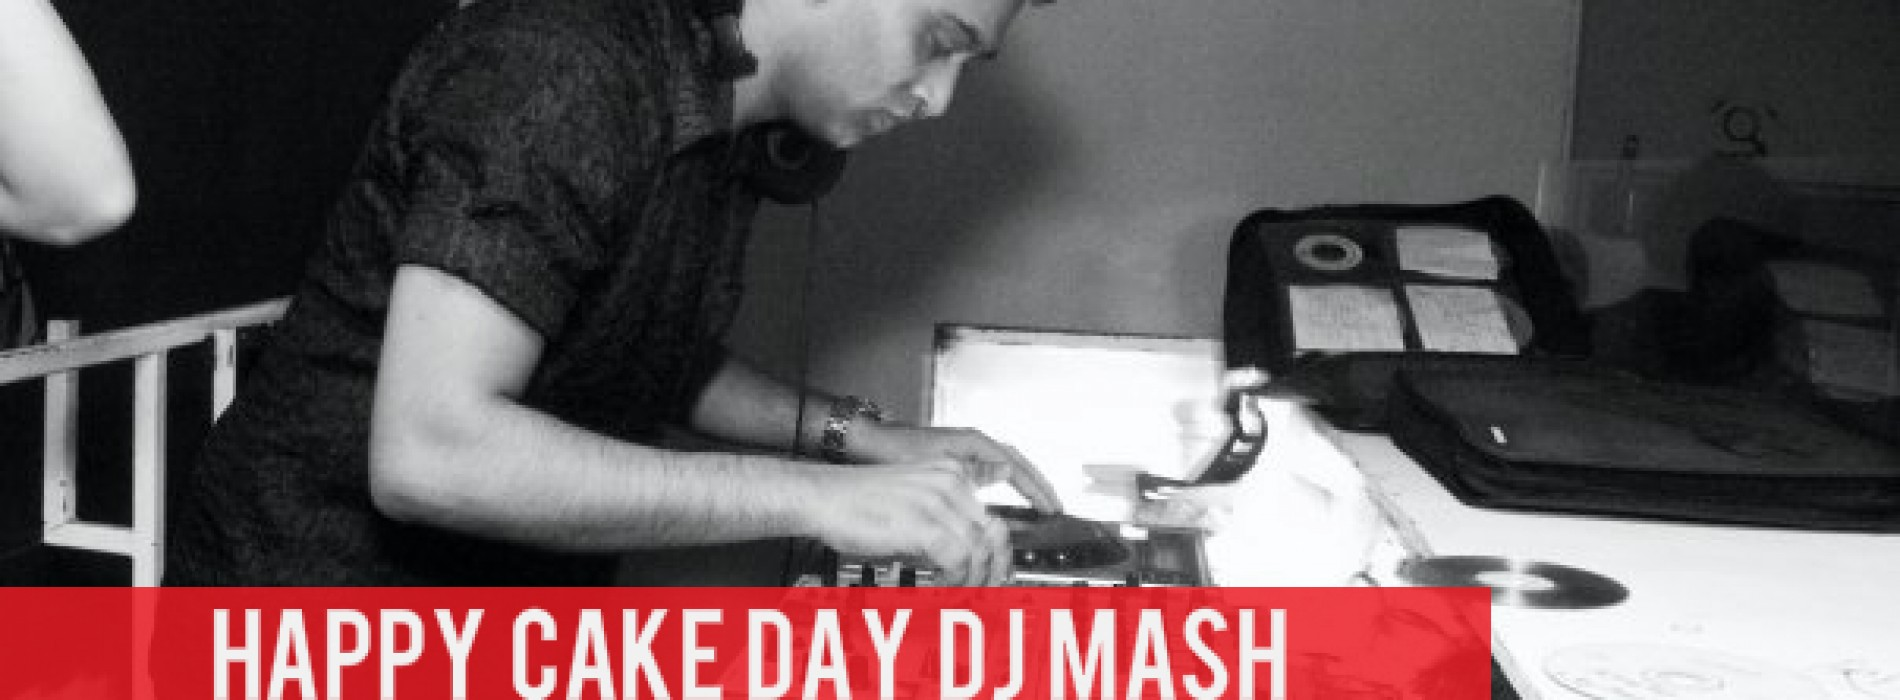 Happy Cake Day Dj Mash